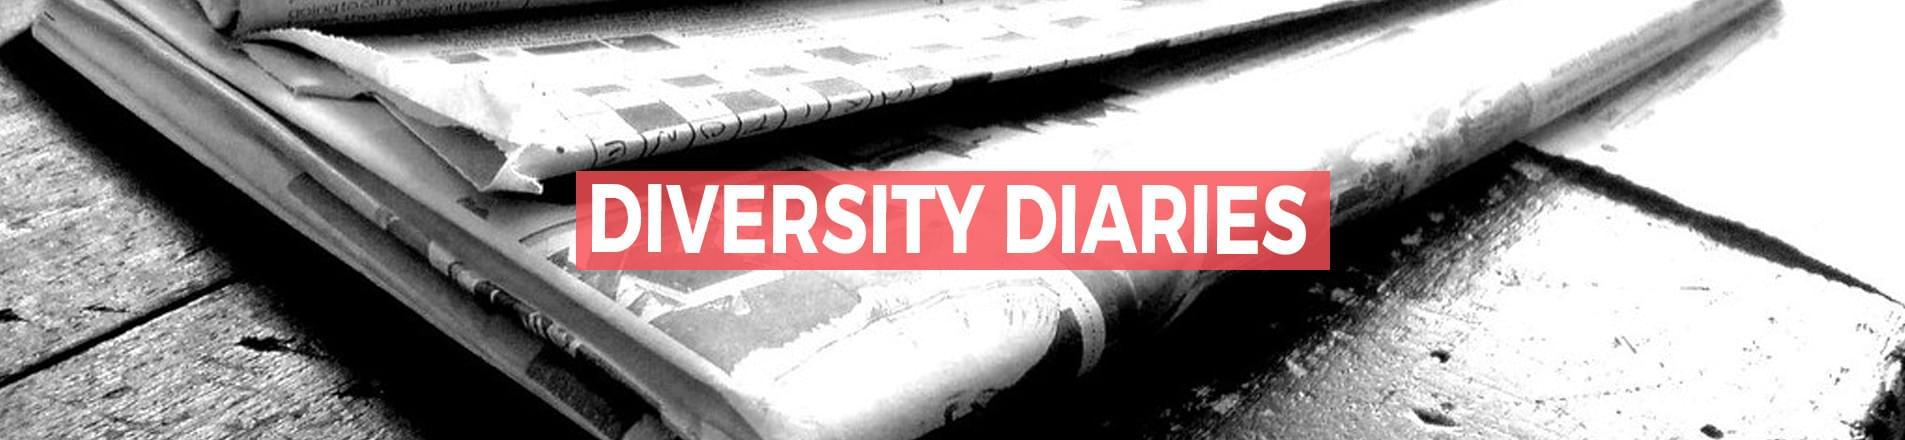 Diversity Diaries two